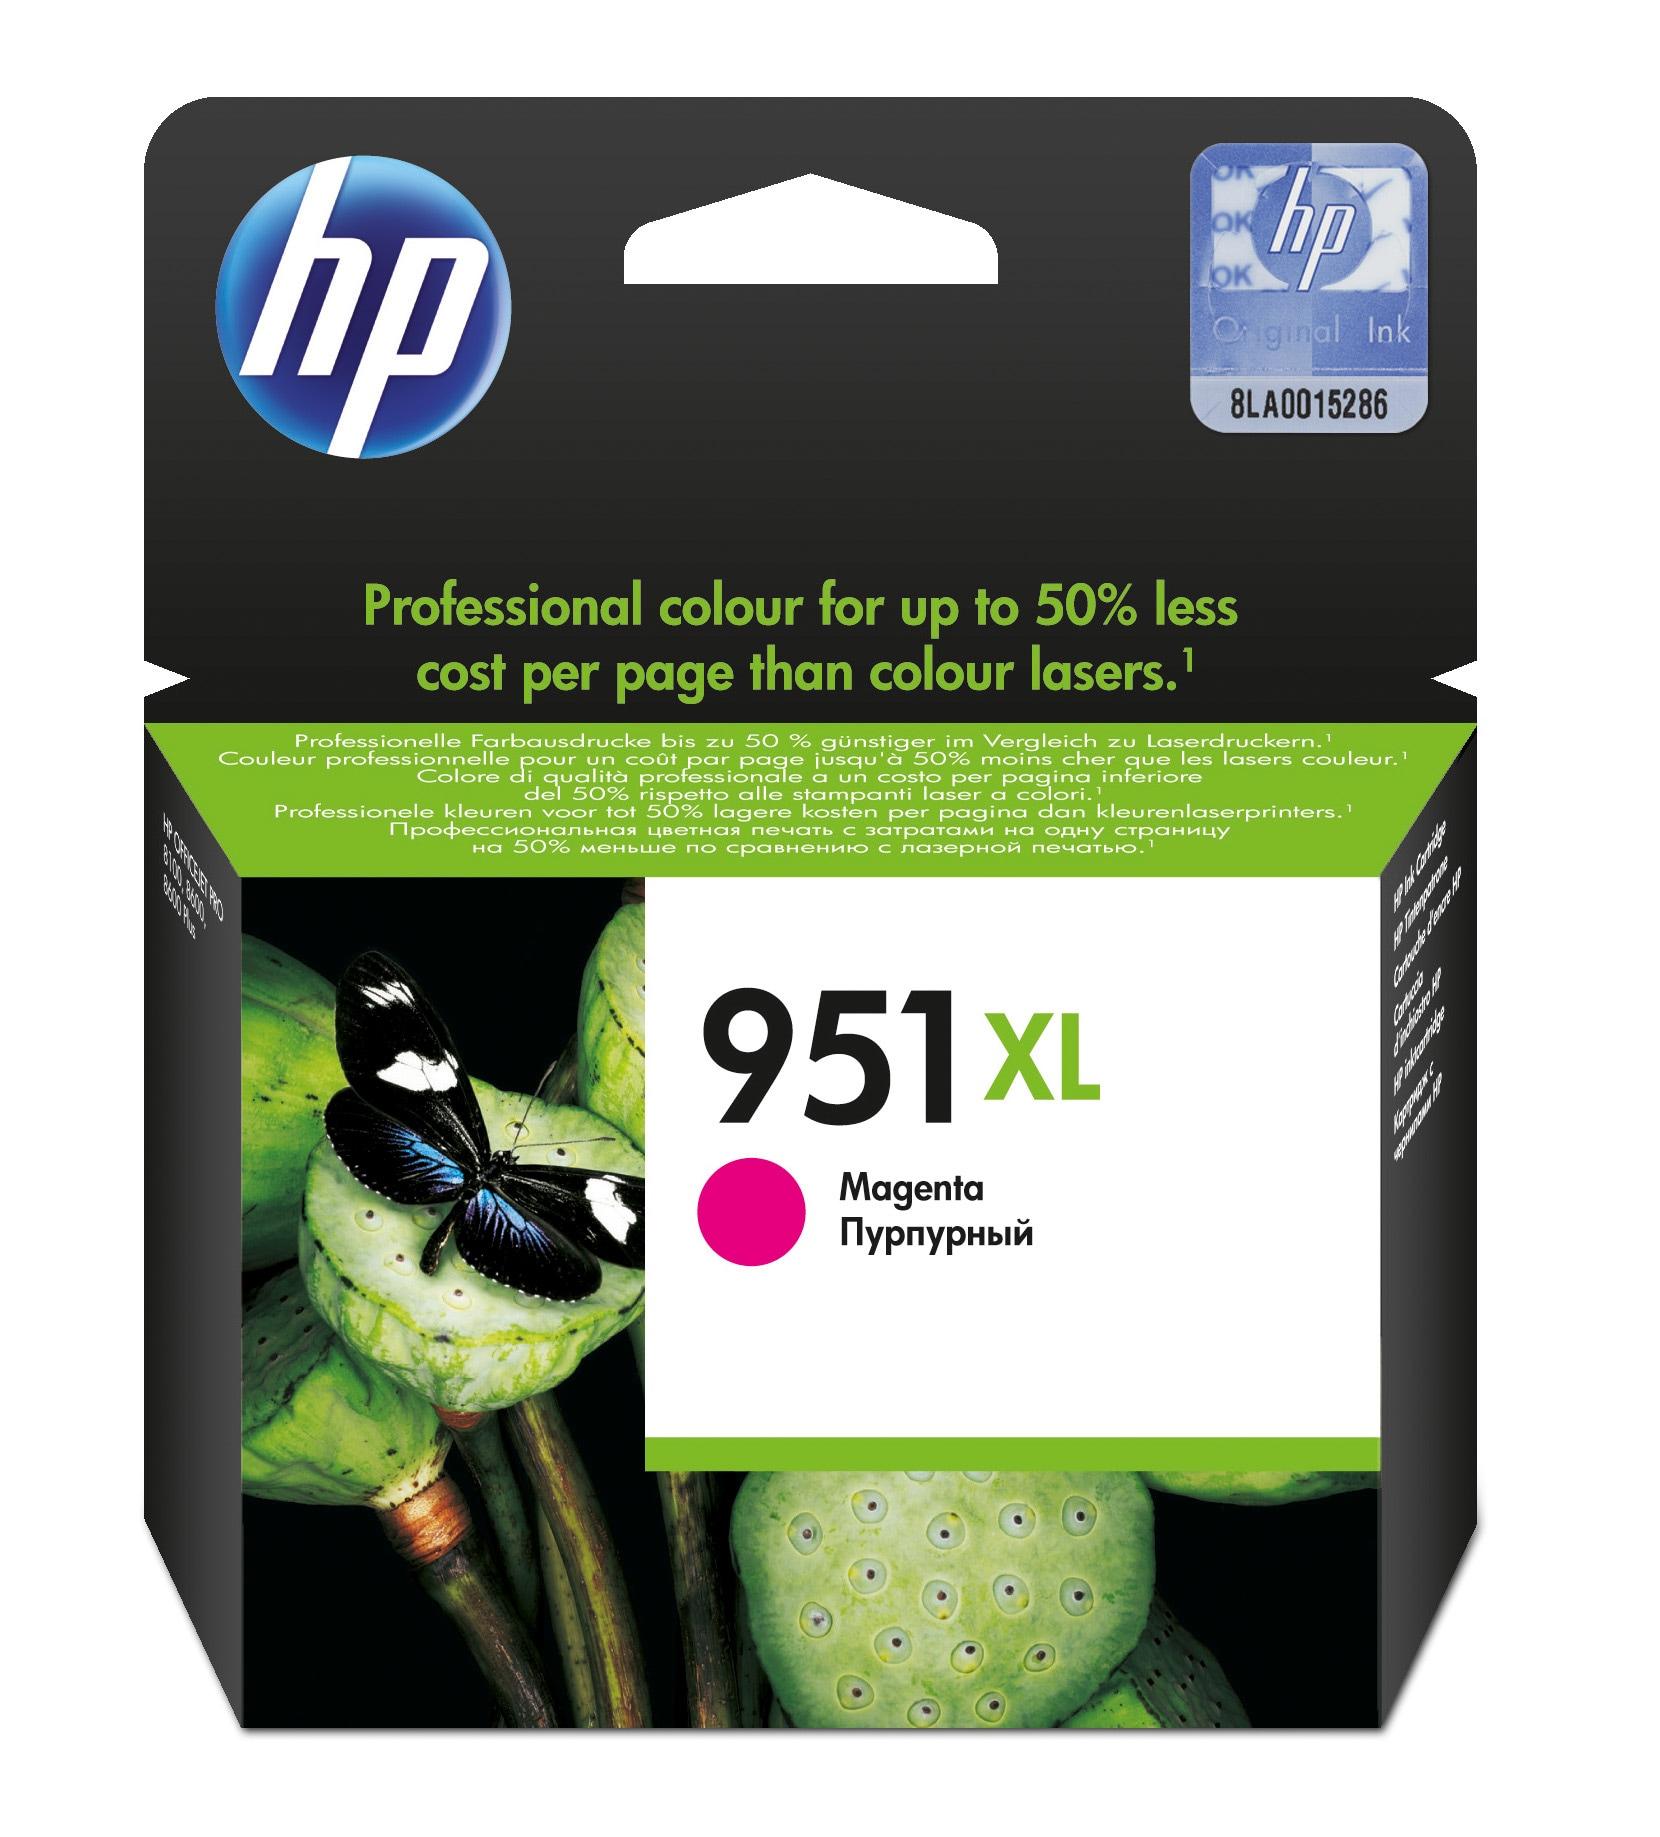 HP CN047AE (951XL) Ink cartridge magenta, 1.5K pages, 17ml